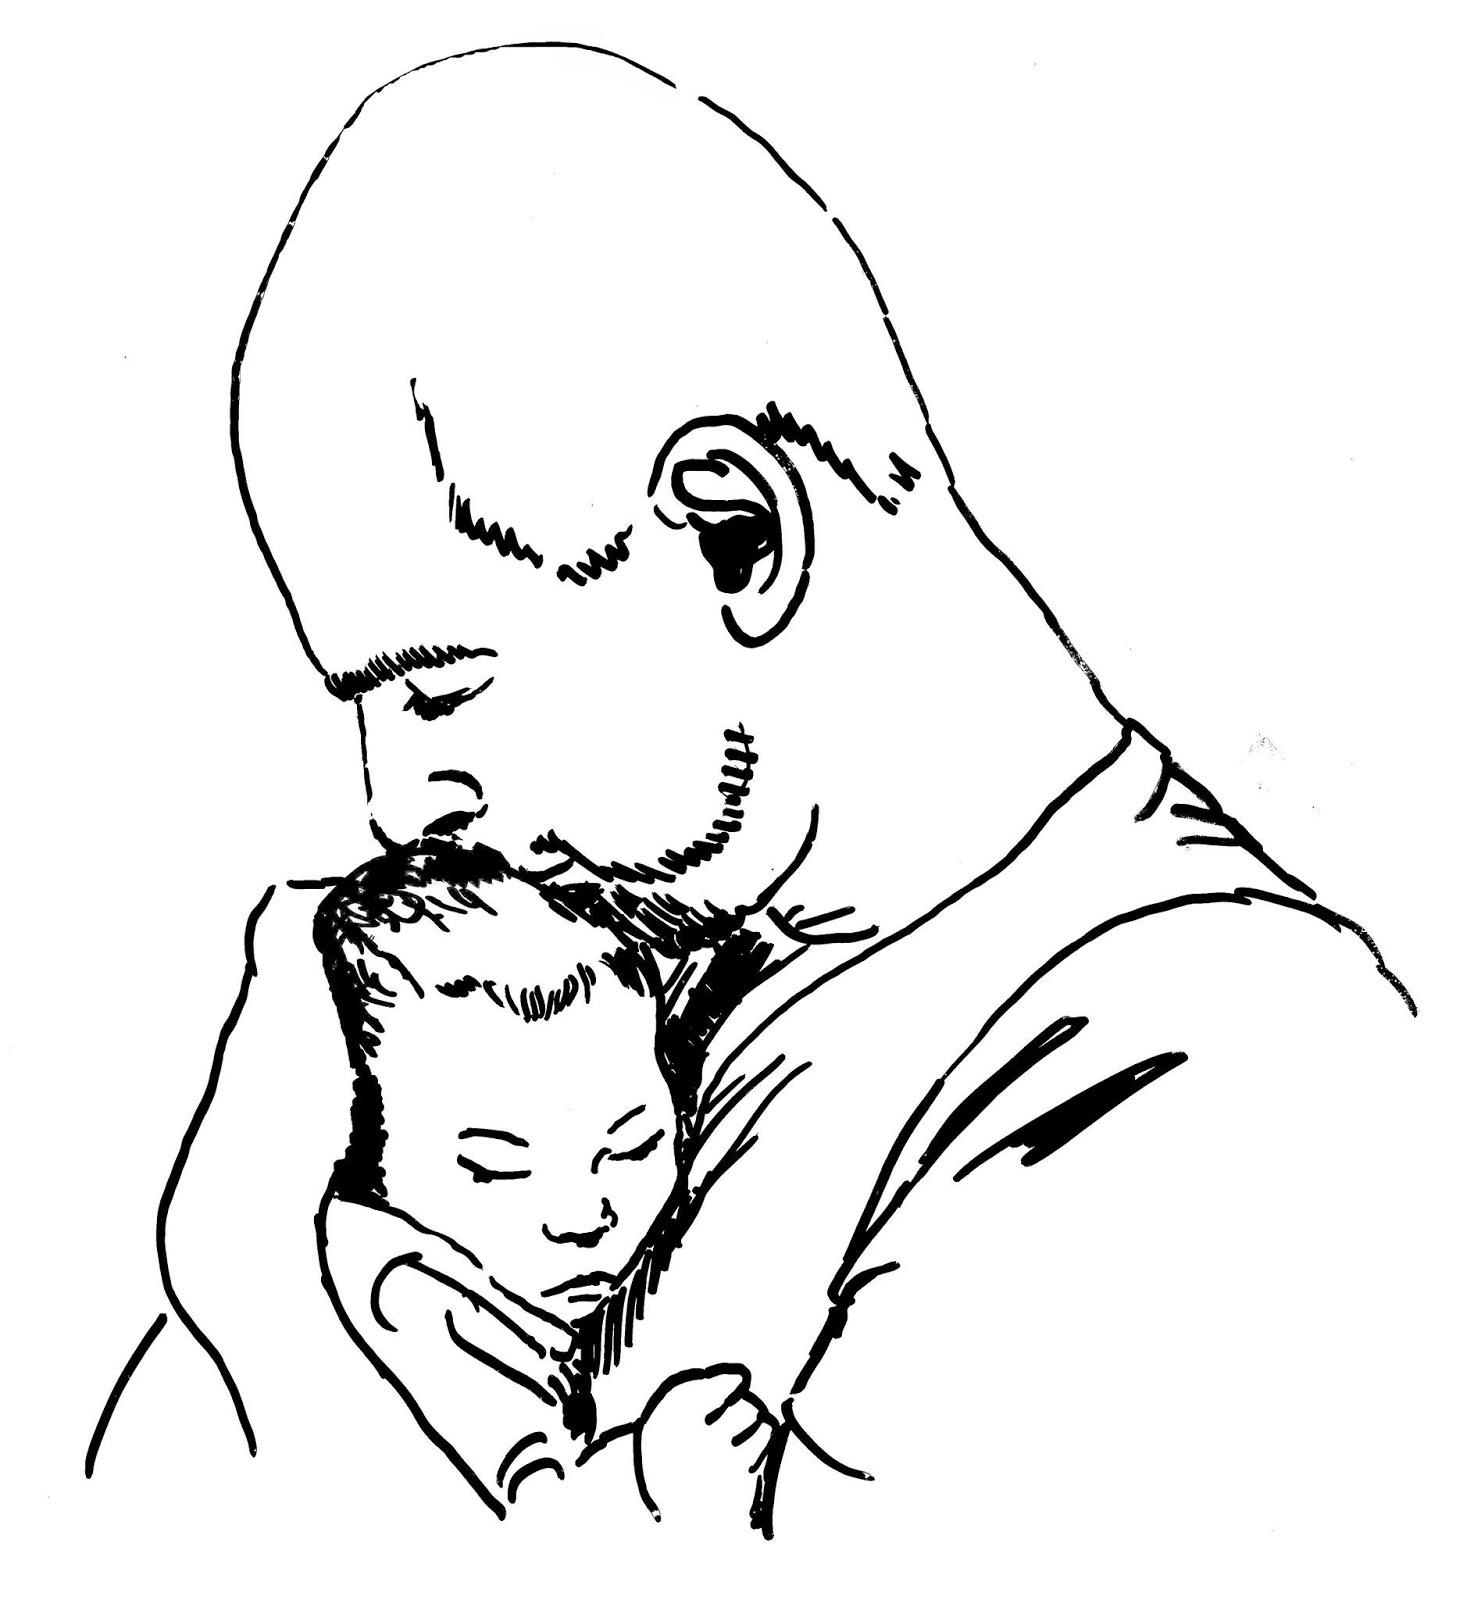 Ojciec to też rodzic!